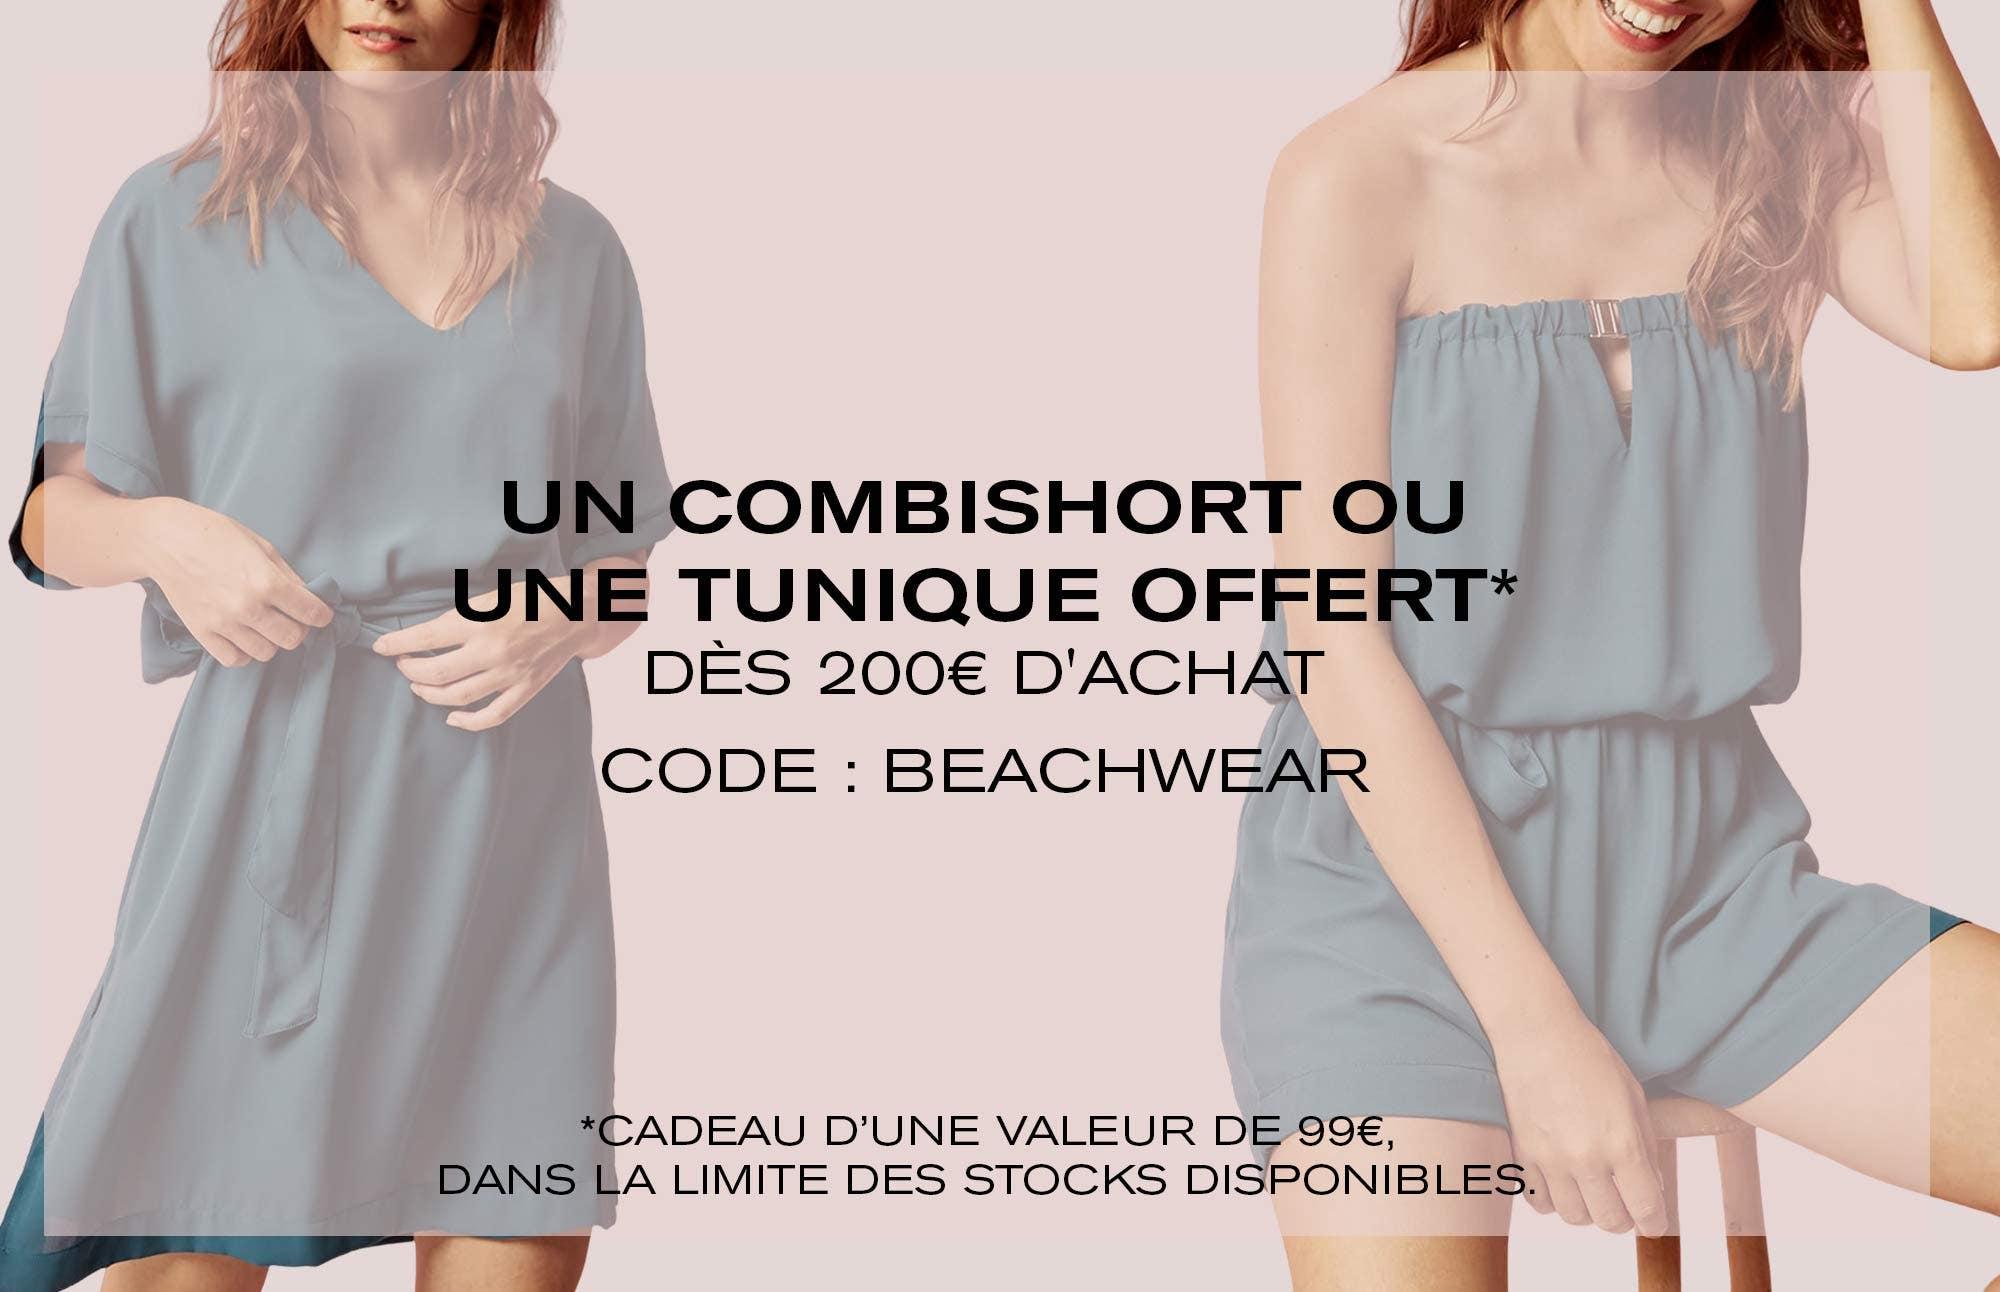 Beachwear | Simone Pérèle